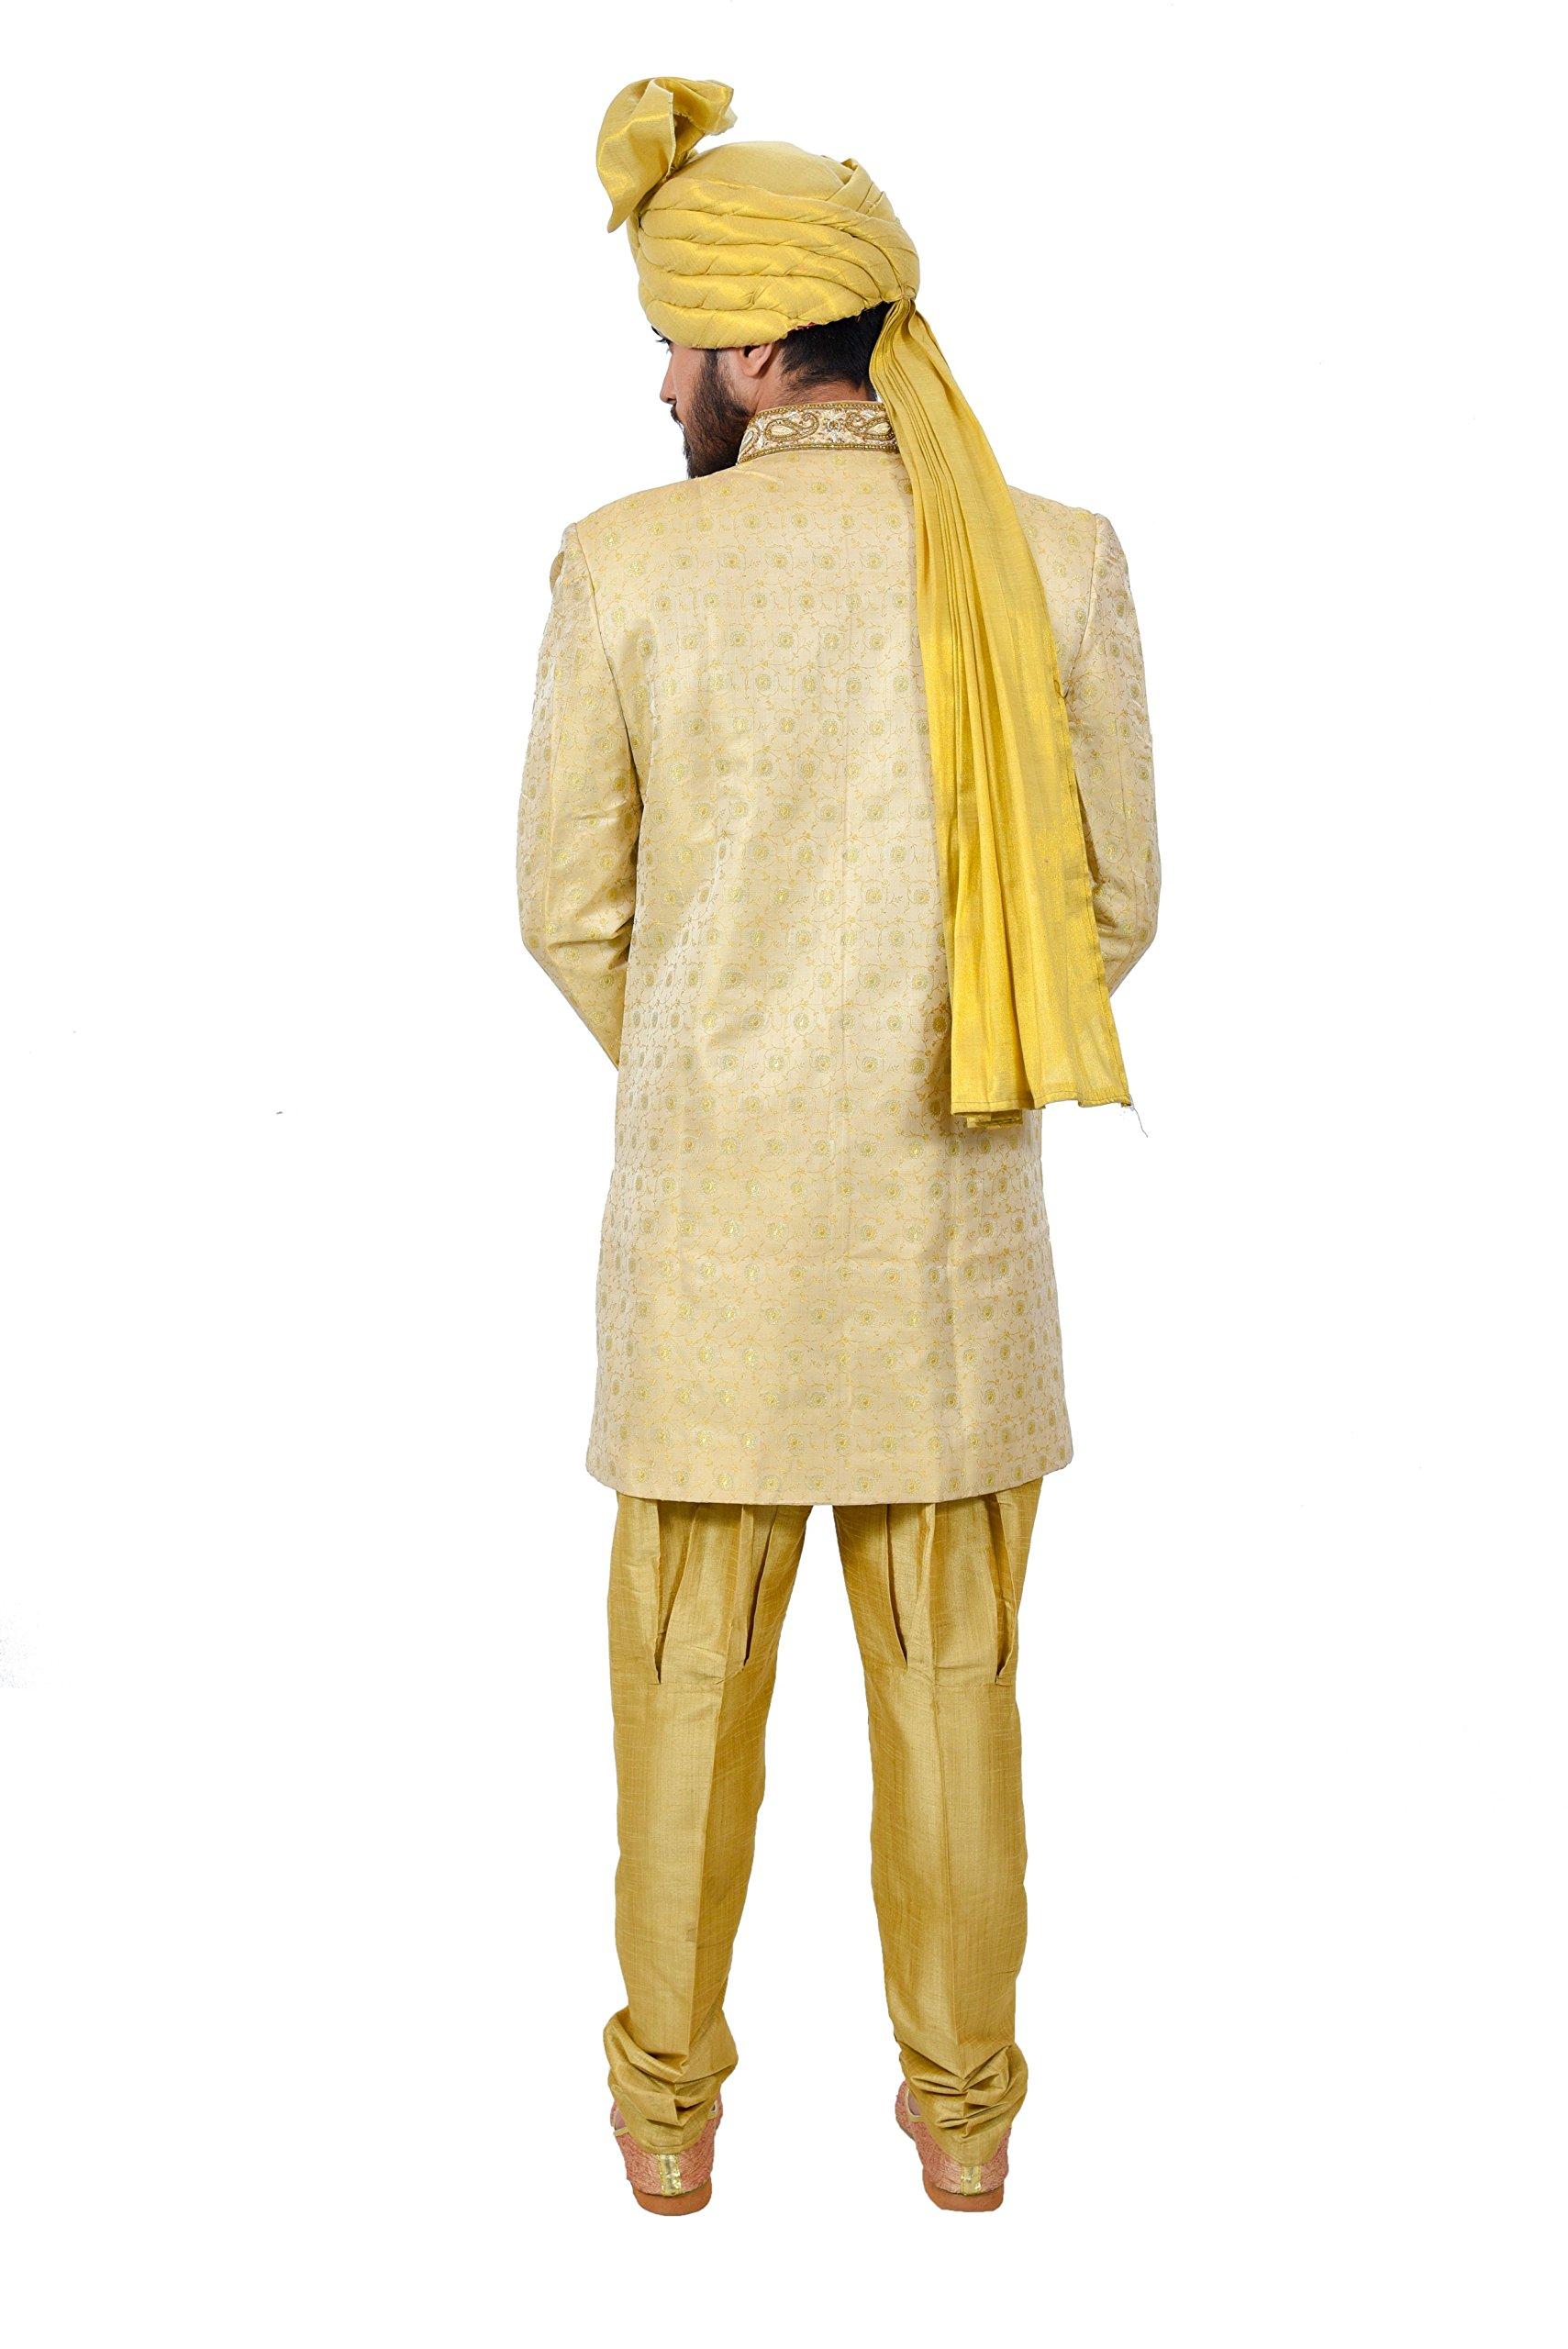 Golden Zari Brocade Silk Traditional Indian Wedding Indo-Western Sherwani for Men by Saris and Things (Image #5)